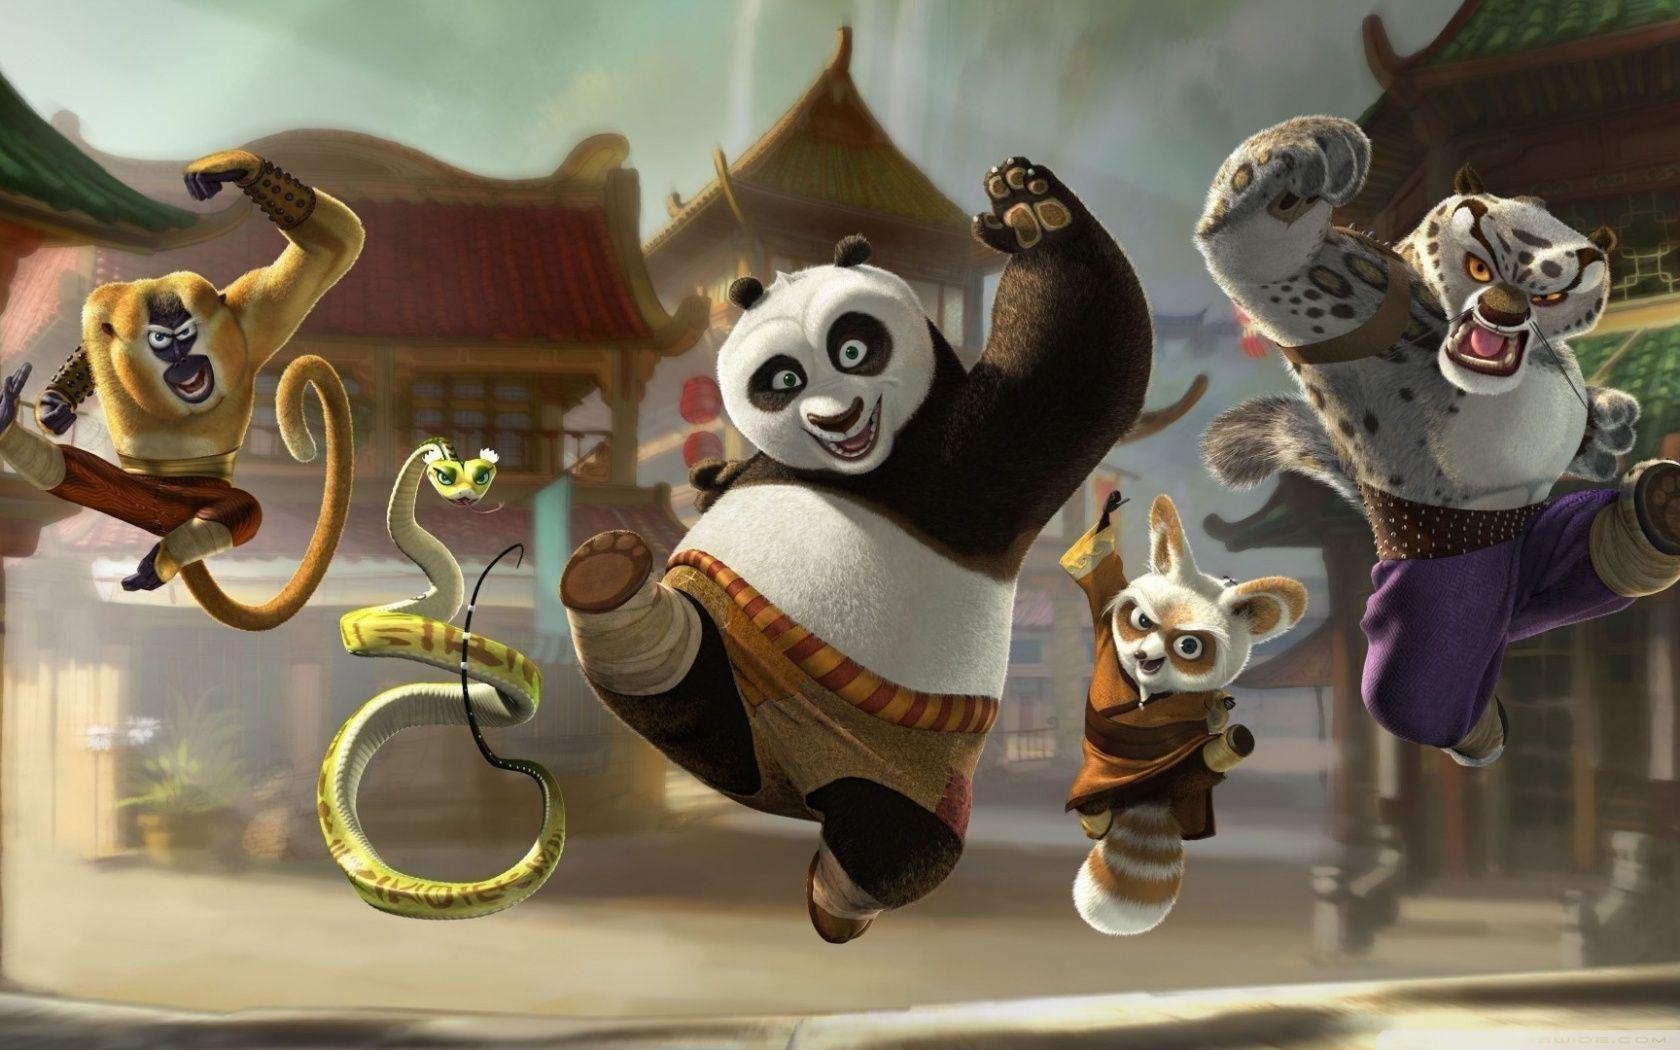 Kung Fu Panda 2 Wallpapers Top Free Kung Fu Panda 2 Backgrounds